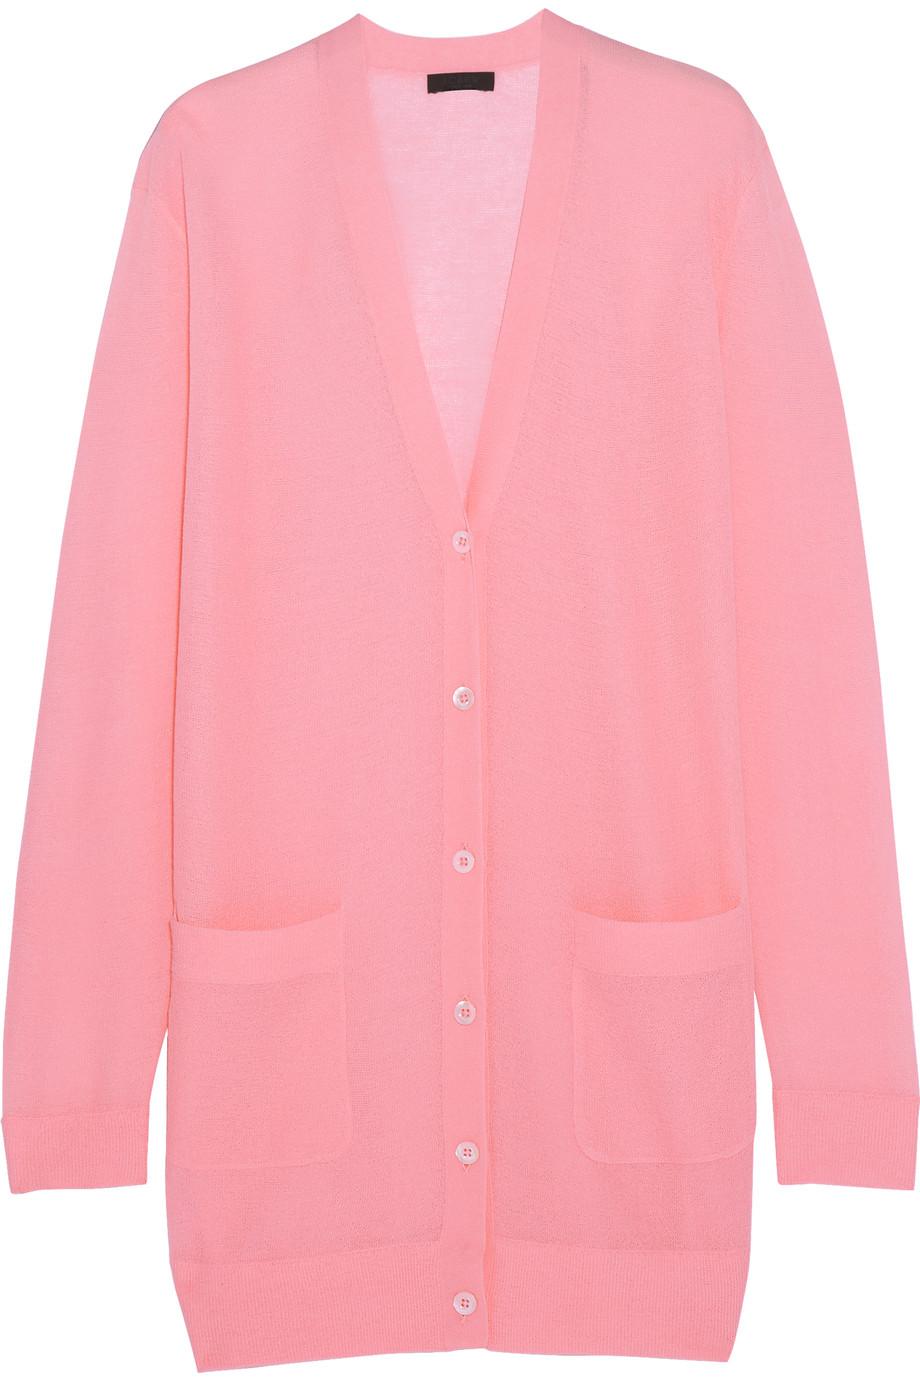 J.Crew Cotton-Blend Cardigan, Baby Pink, Women's, Size: S